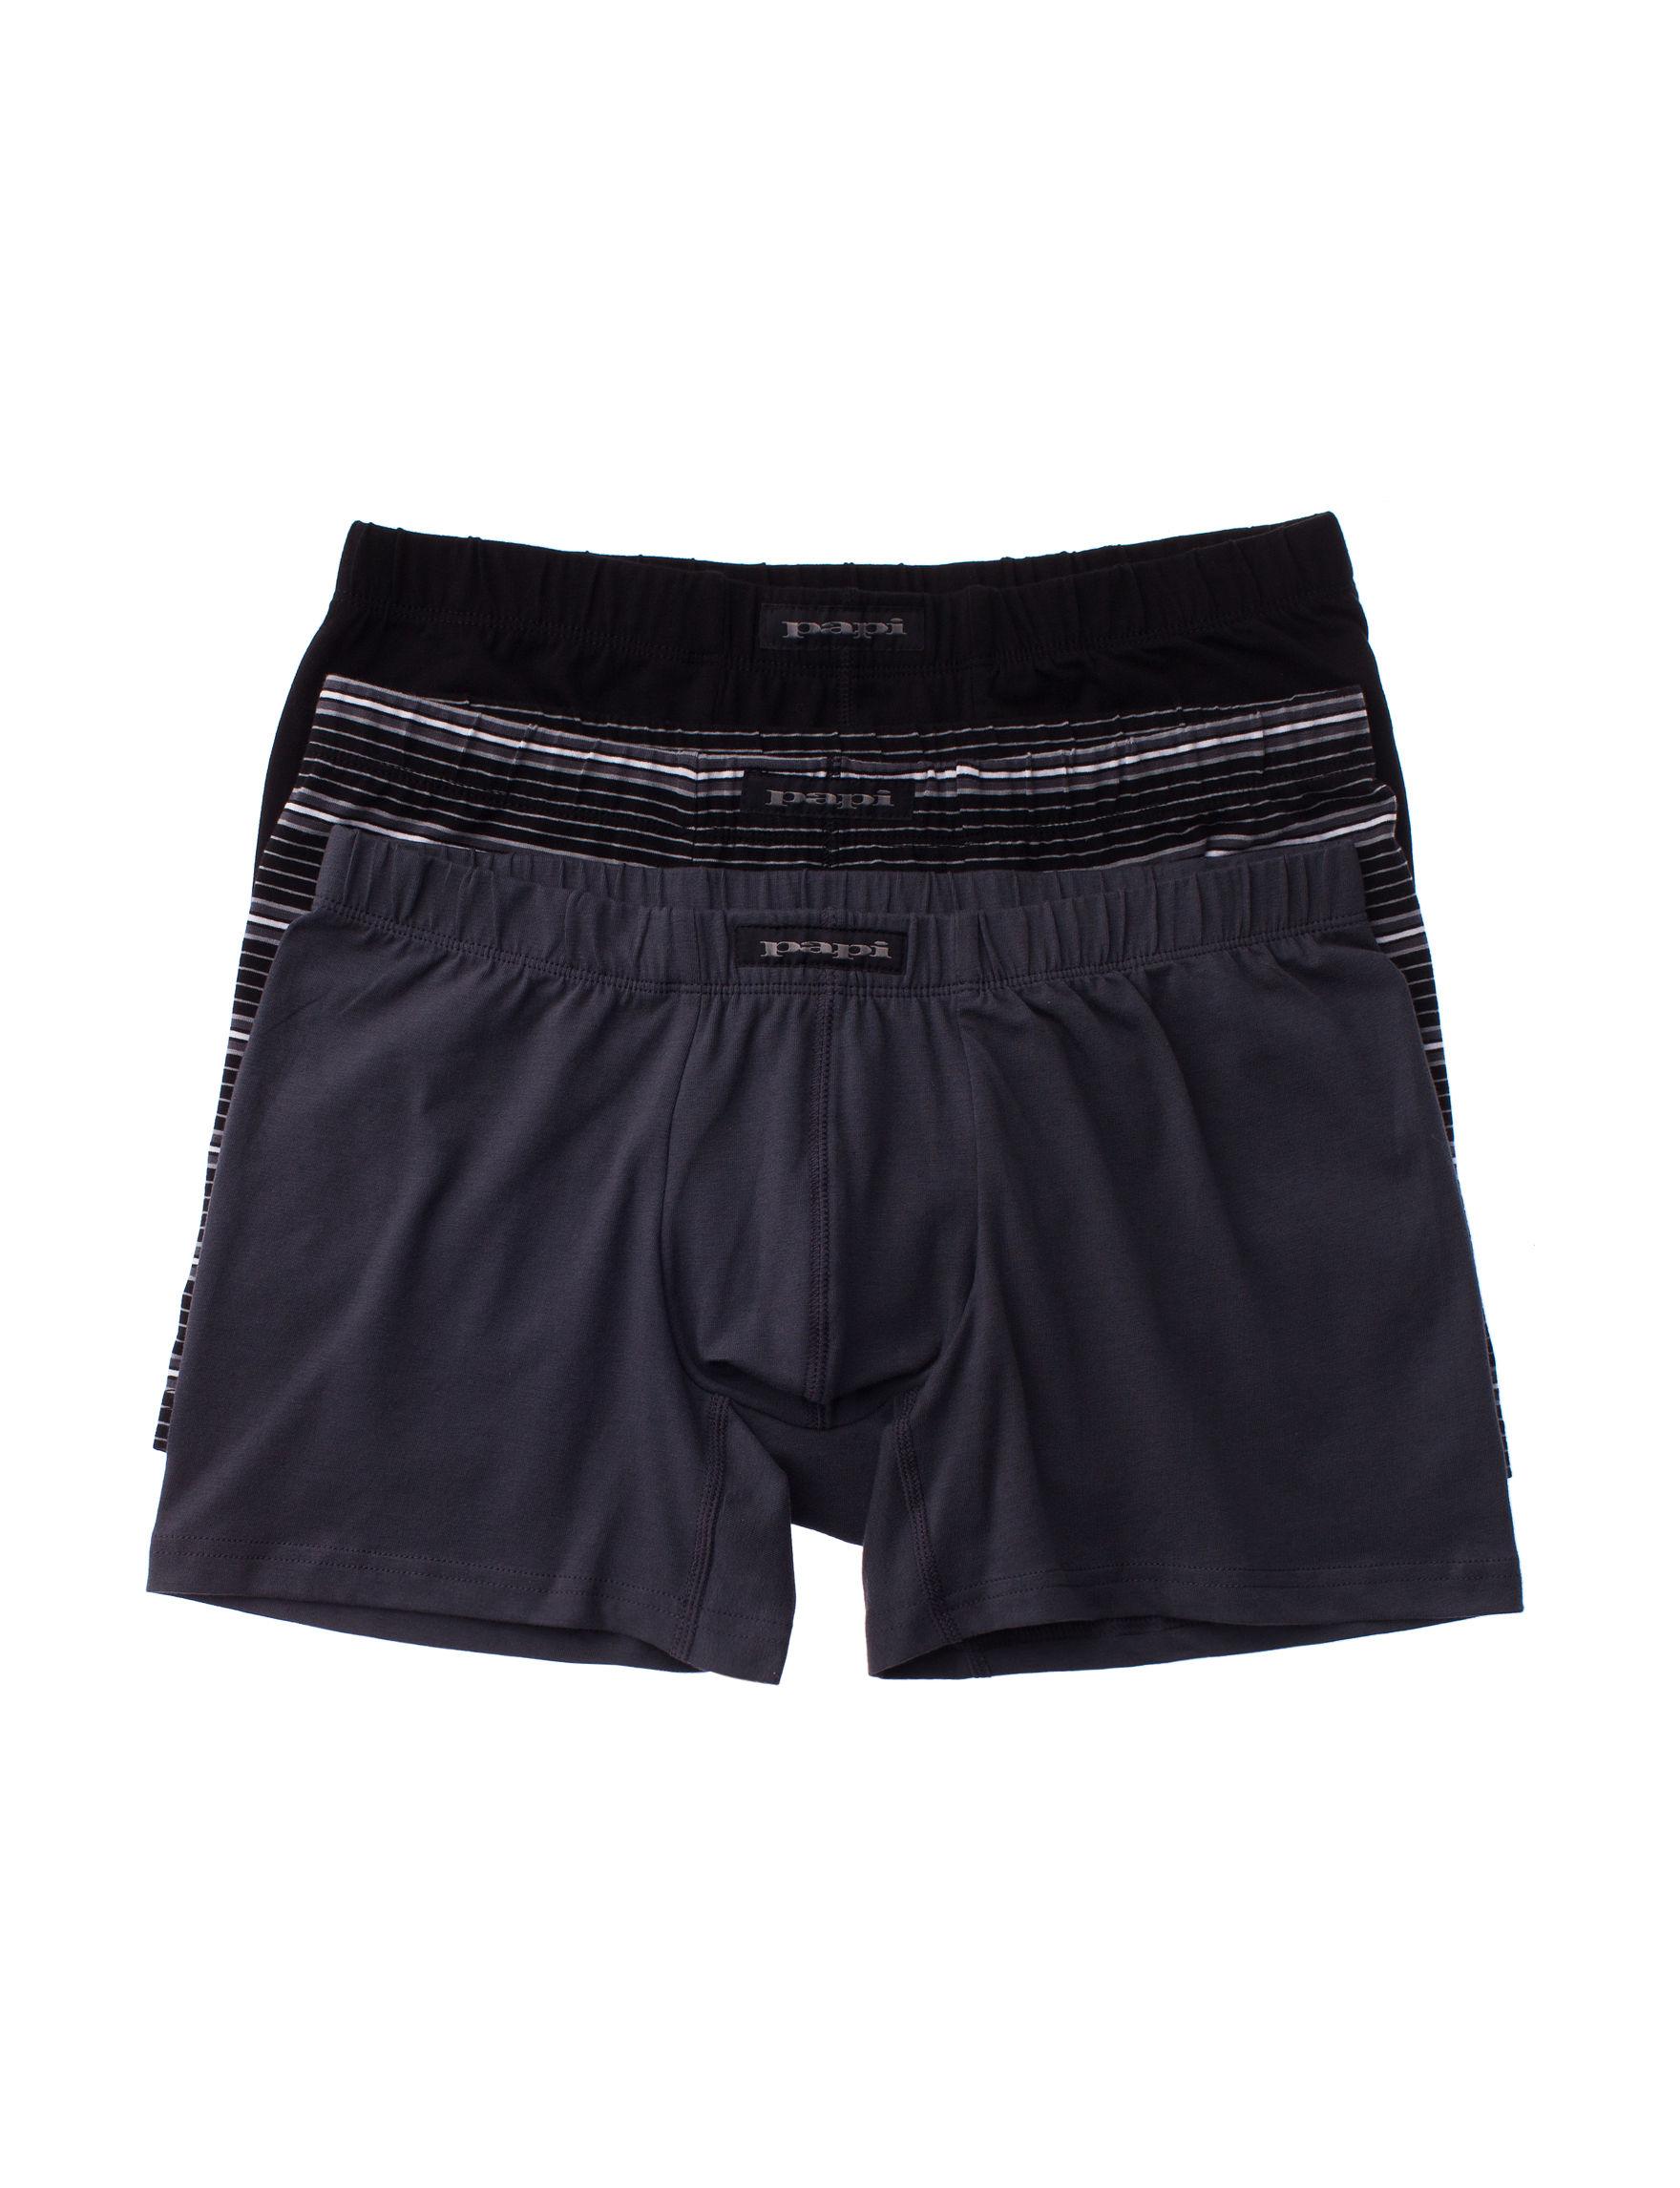 Papi Grey / Black Boxer Briefs